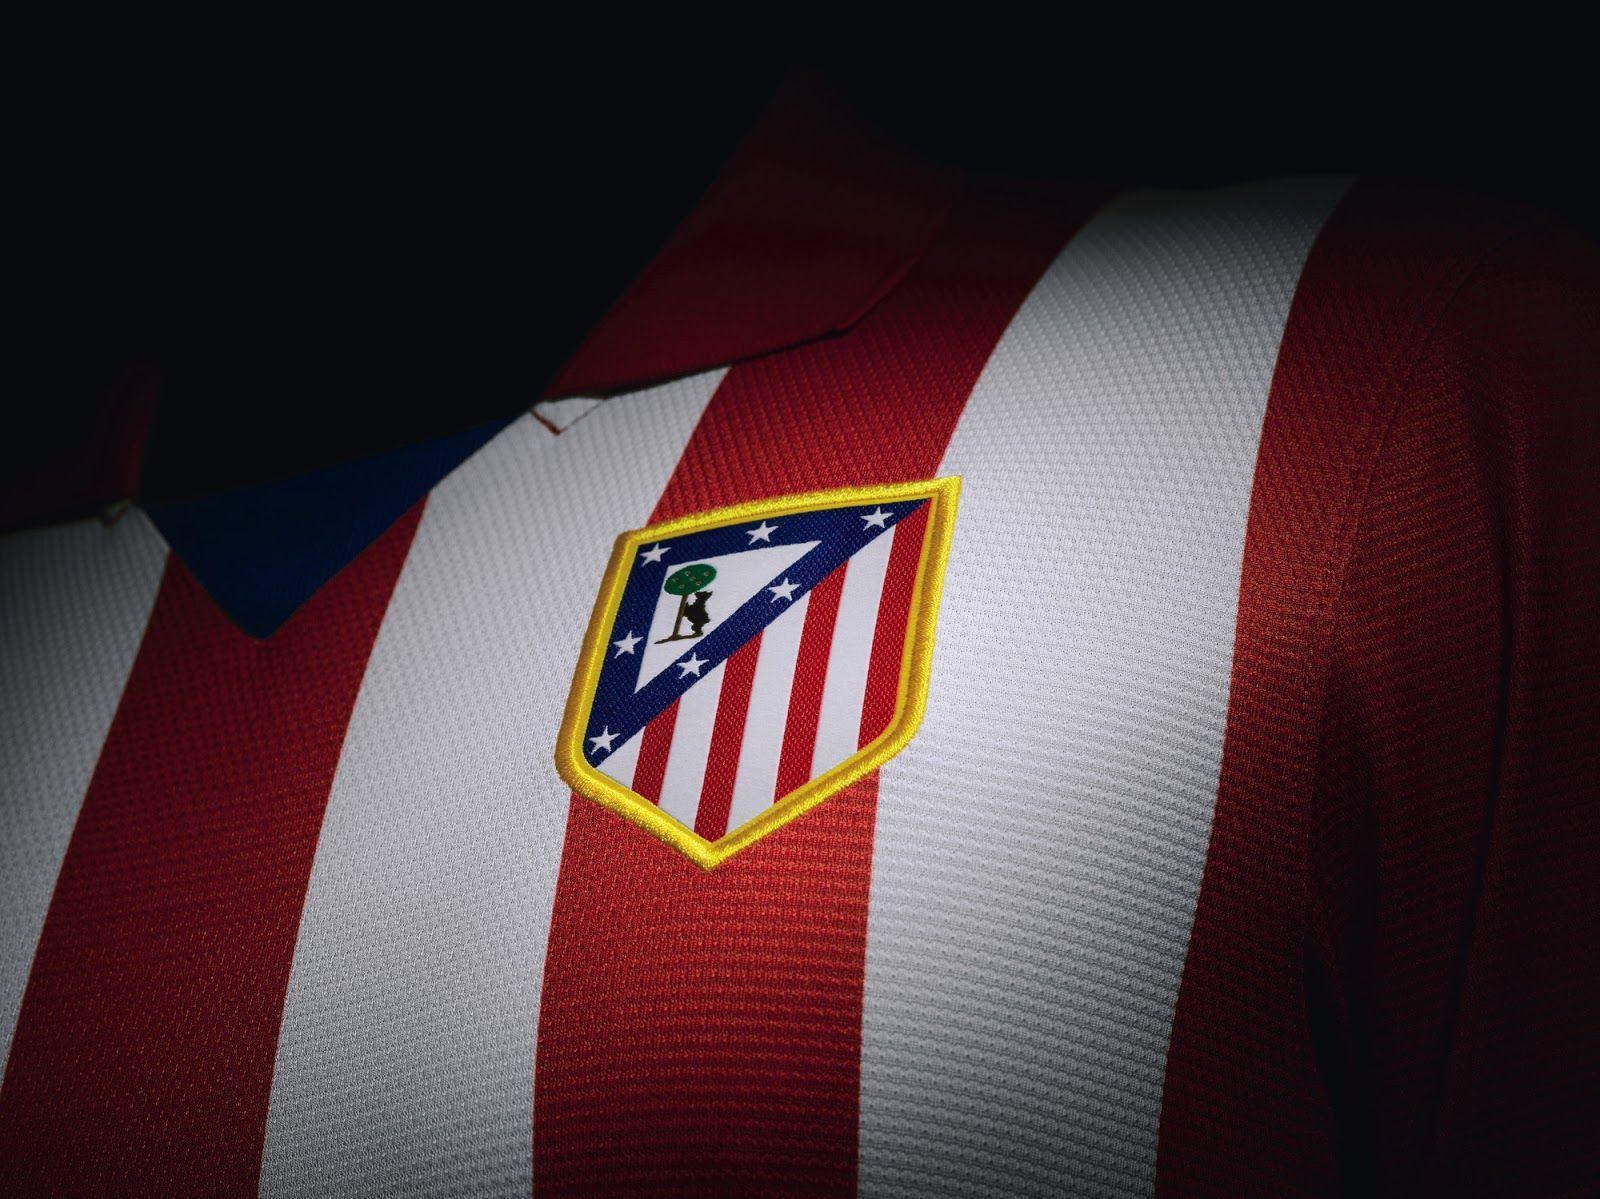 Atletico Madrid Professional Spanish Football Club Background Images